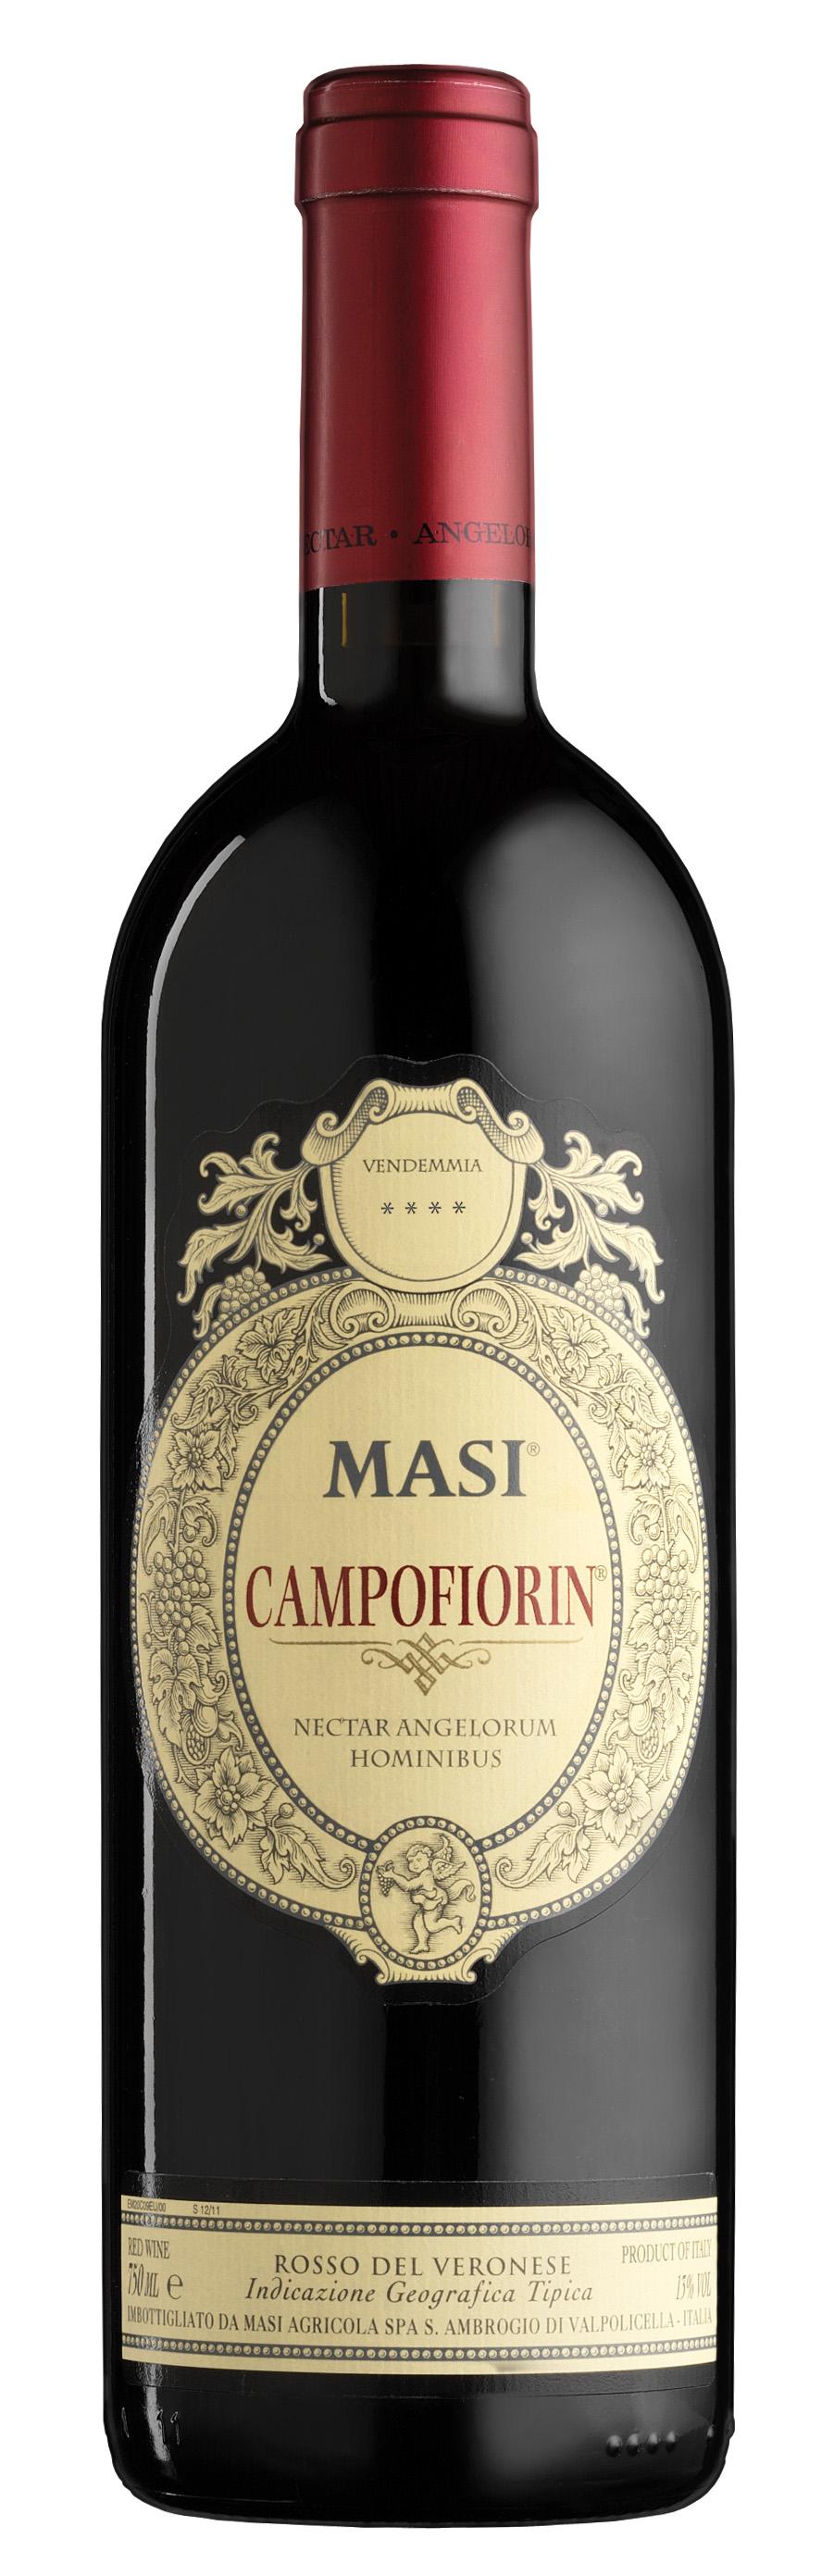 masi_Campofiorin_btlHR.jpg